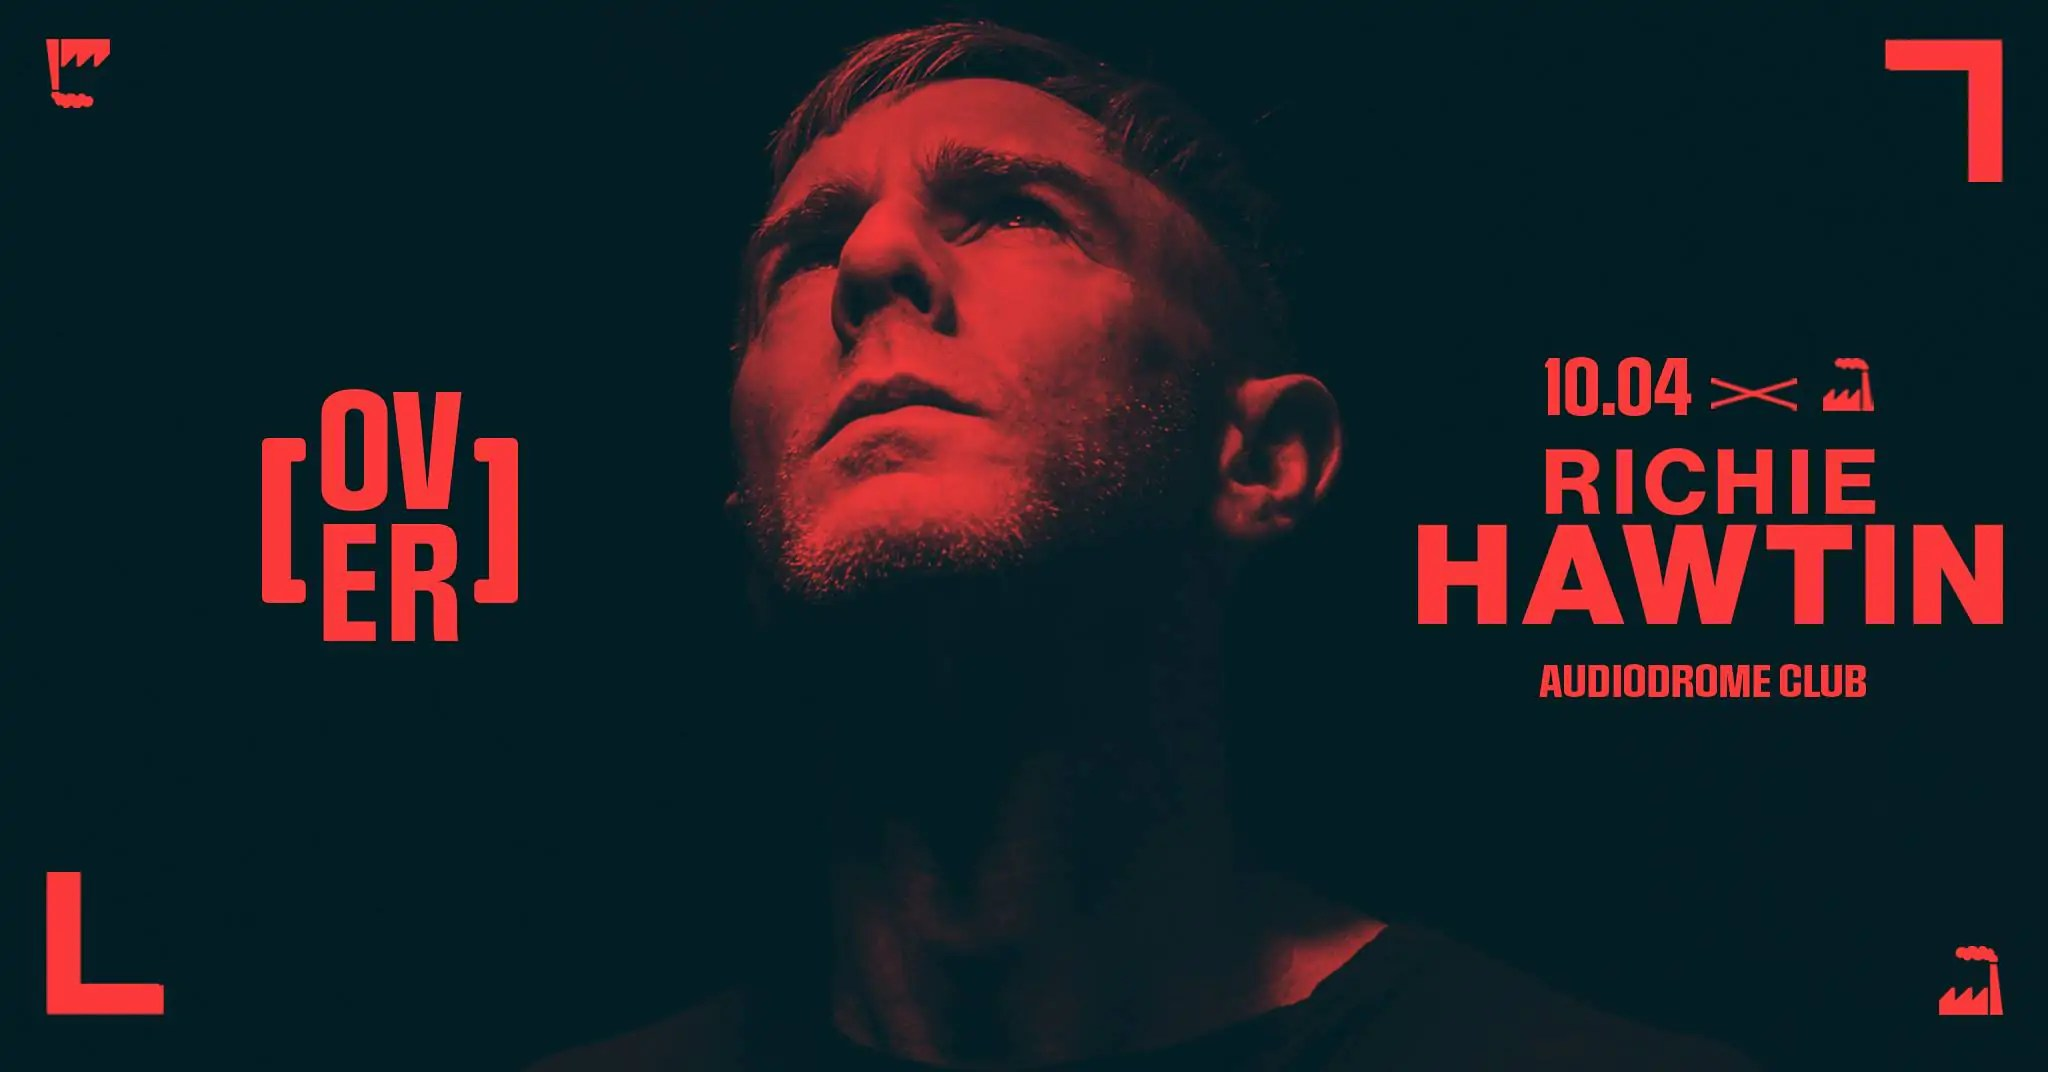 Richie Hawtin Audiodrome Live club Moncalieri Torino il 10 04 2020